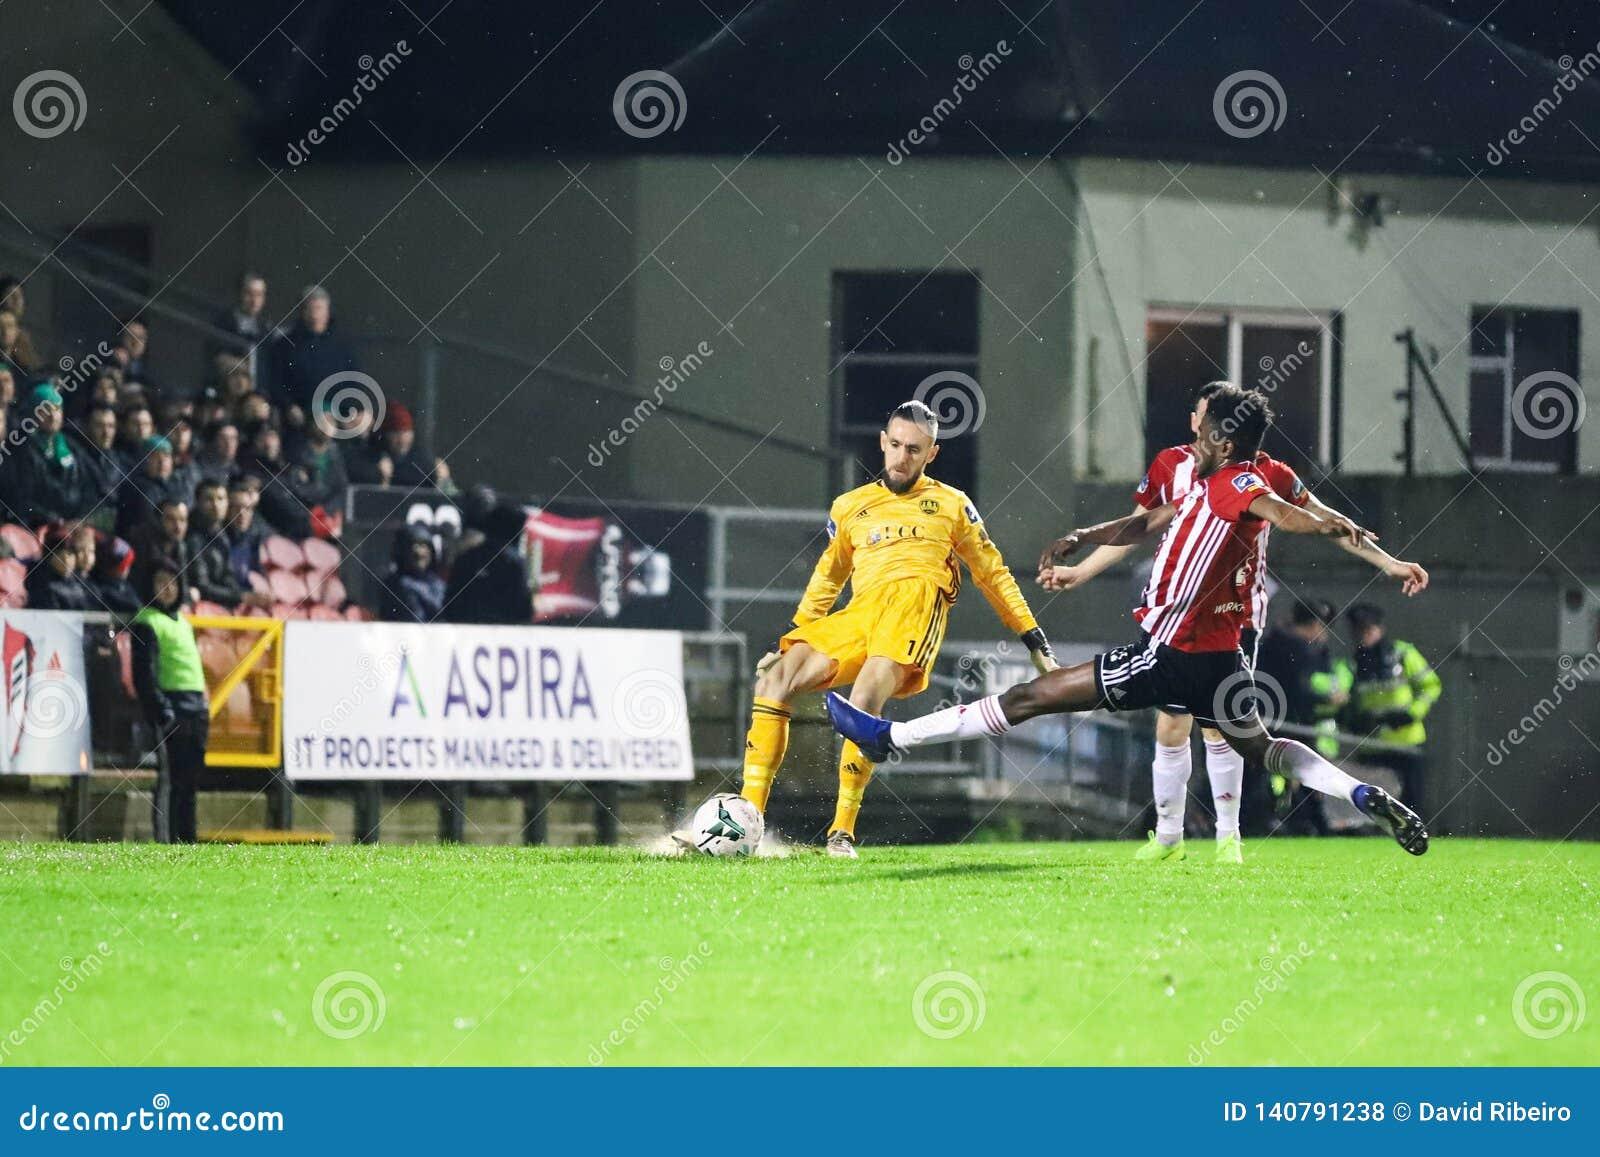 Mark McNulty at League of Ireland Premier Division match Cork City FC vs Derry City FC